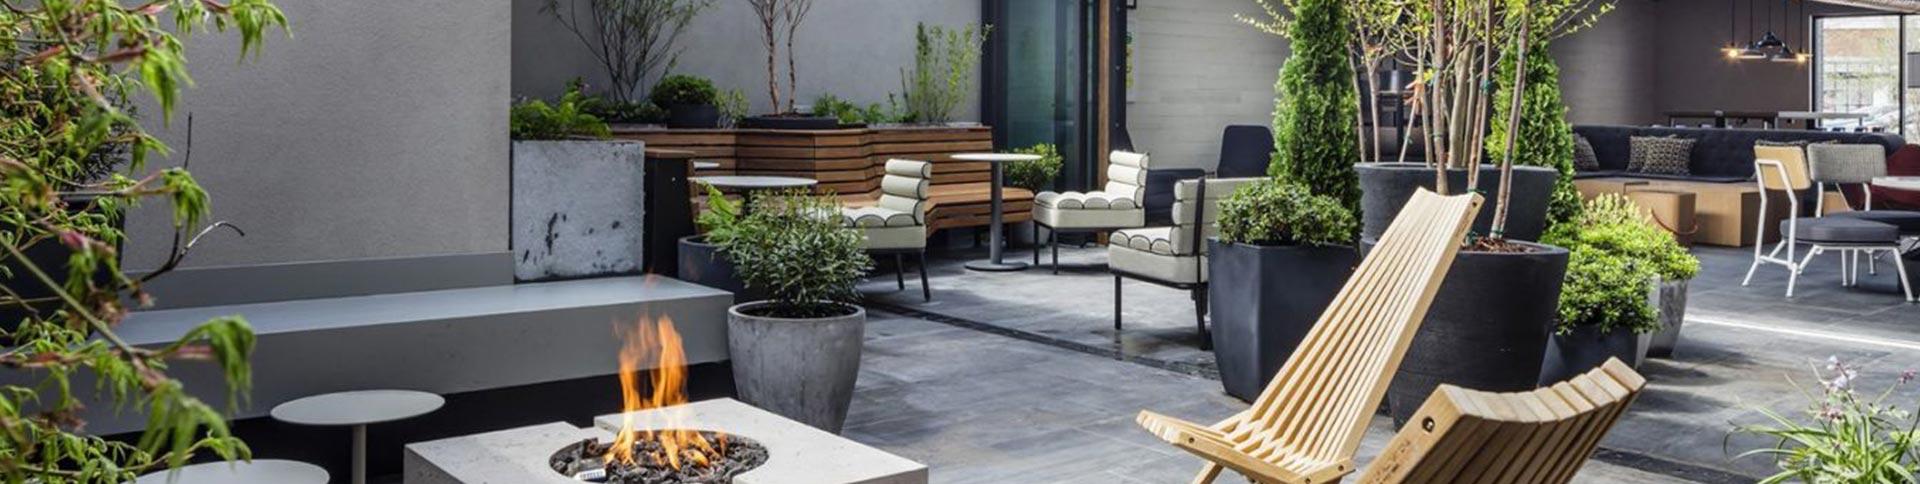 Secret Garden Lounge in Cambridge